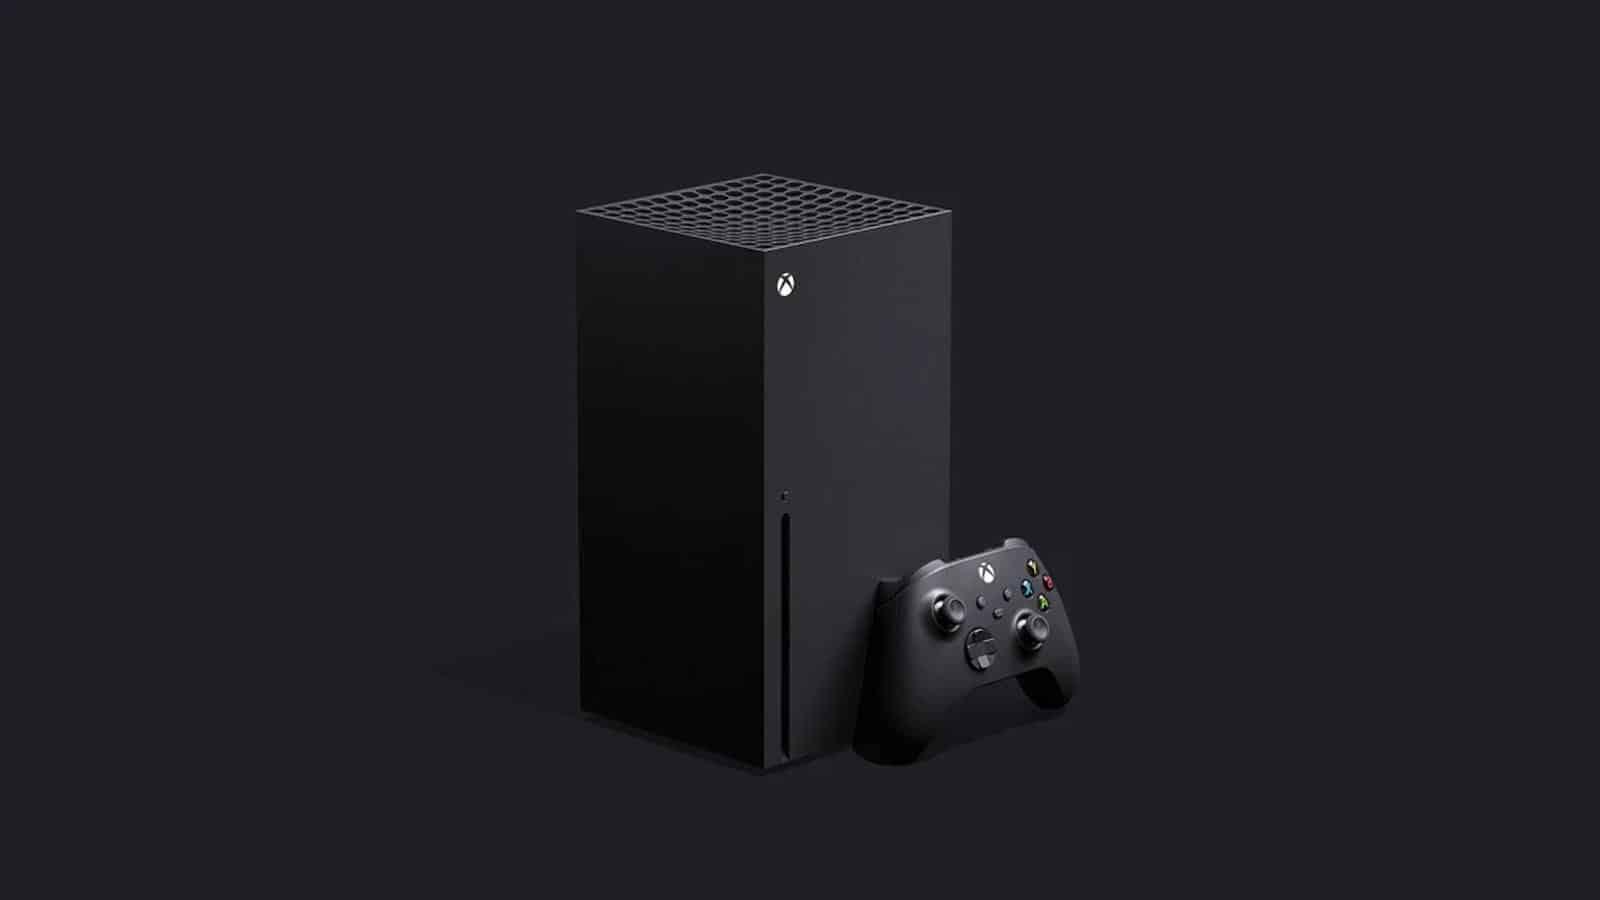 xbox series x on black background